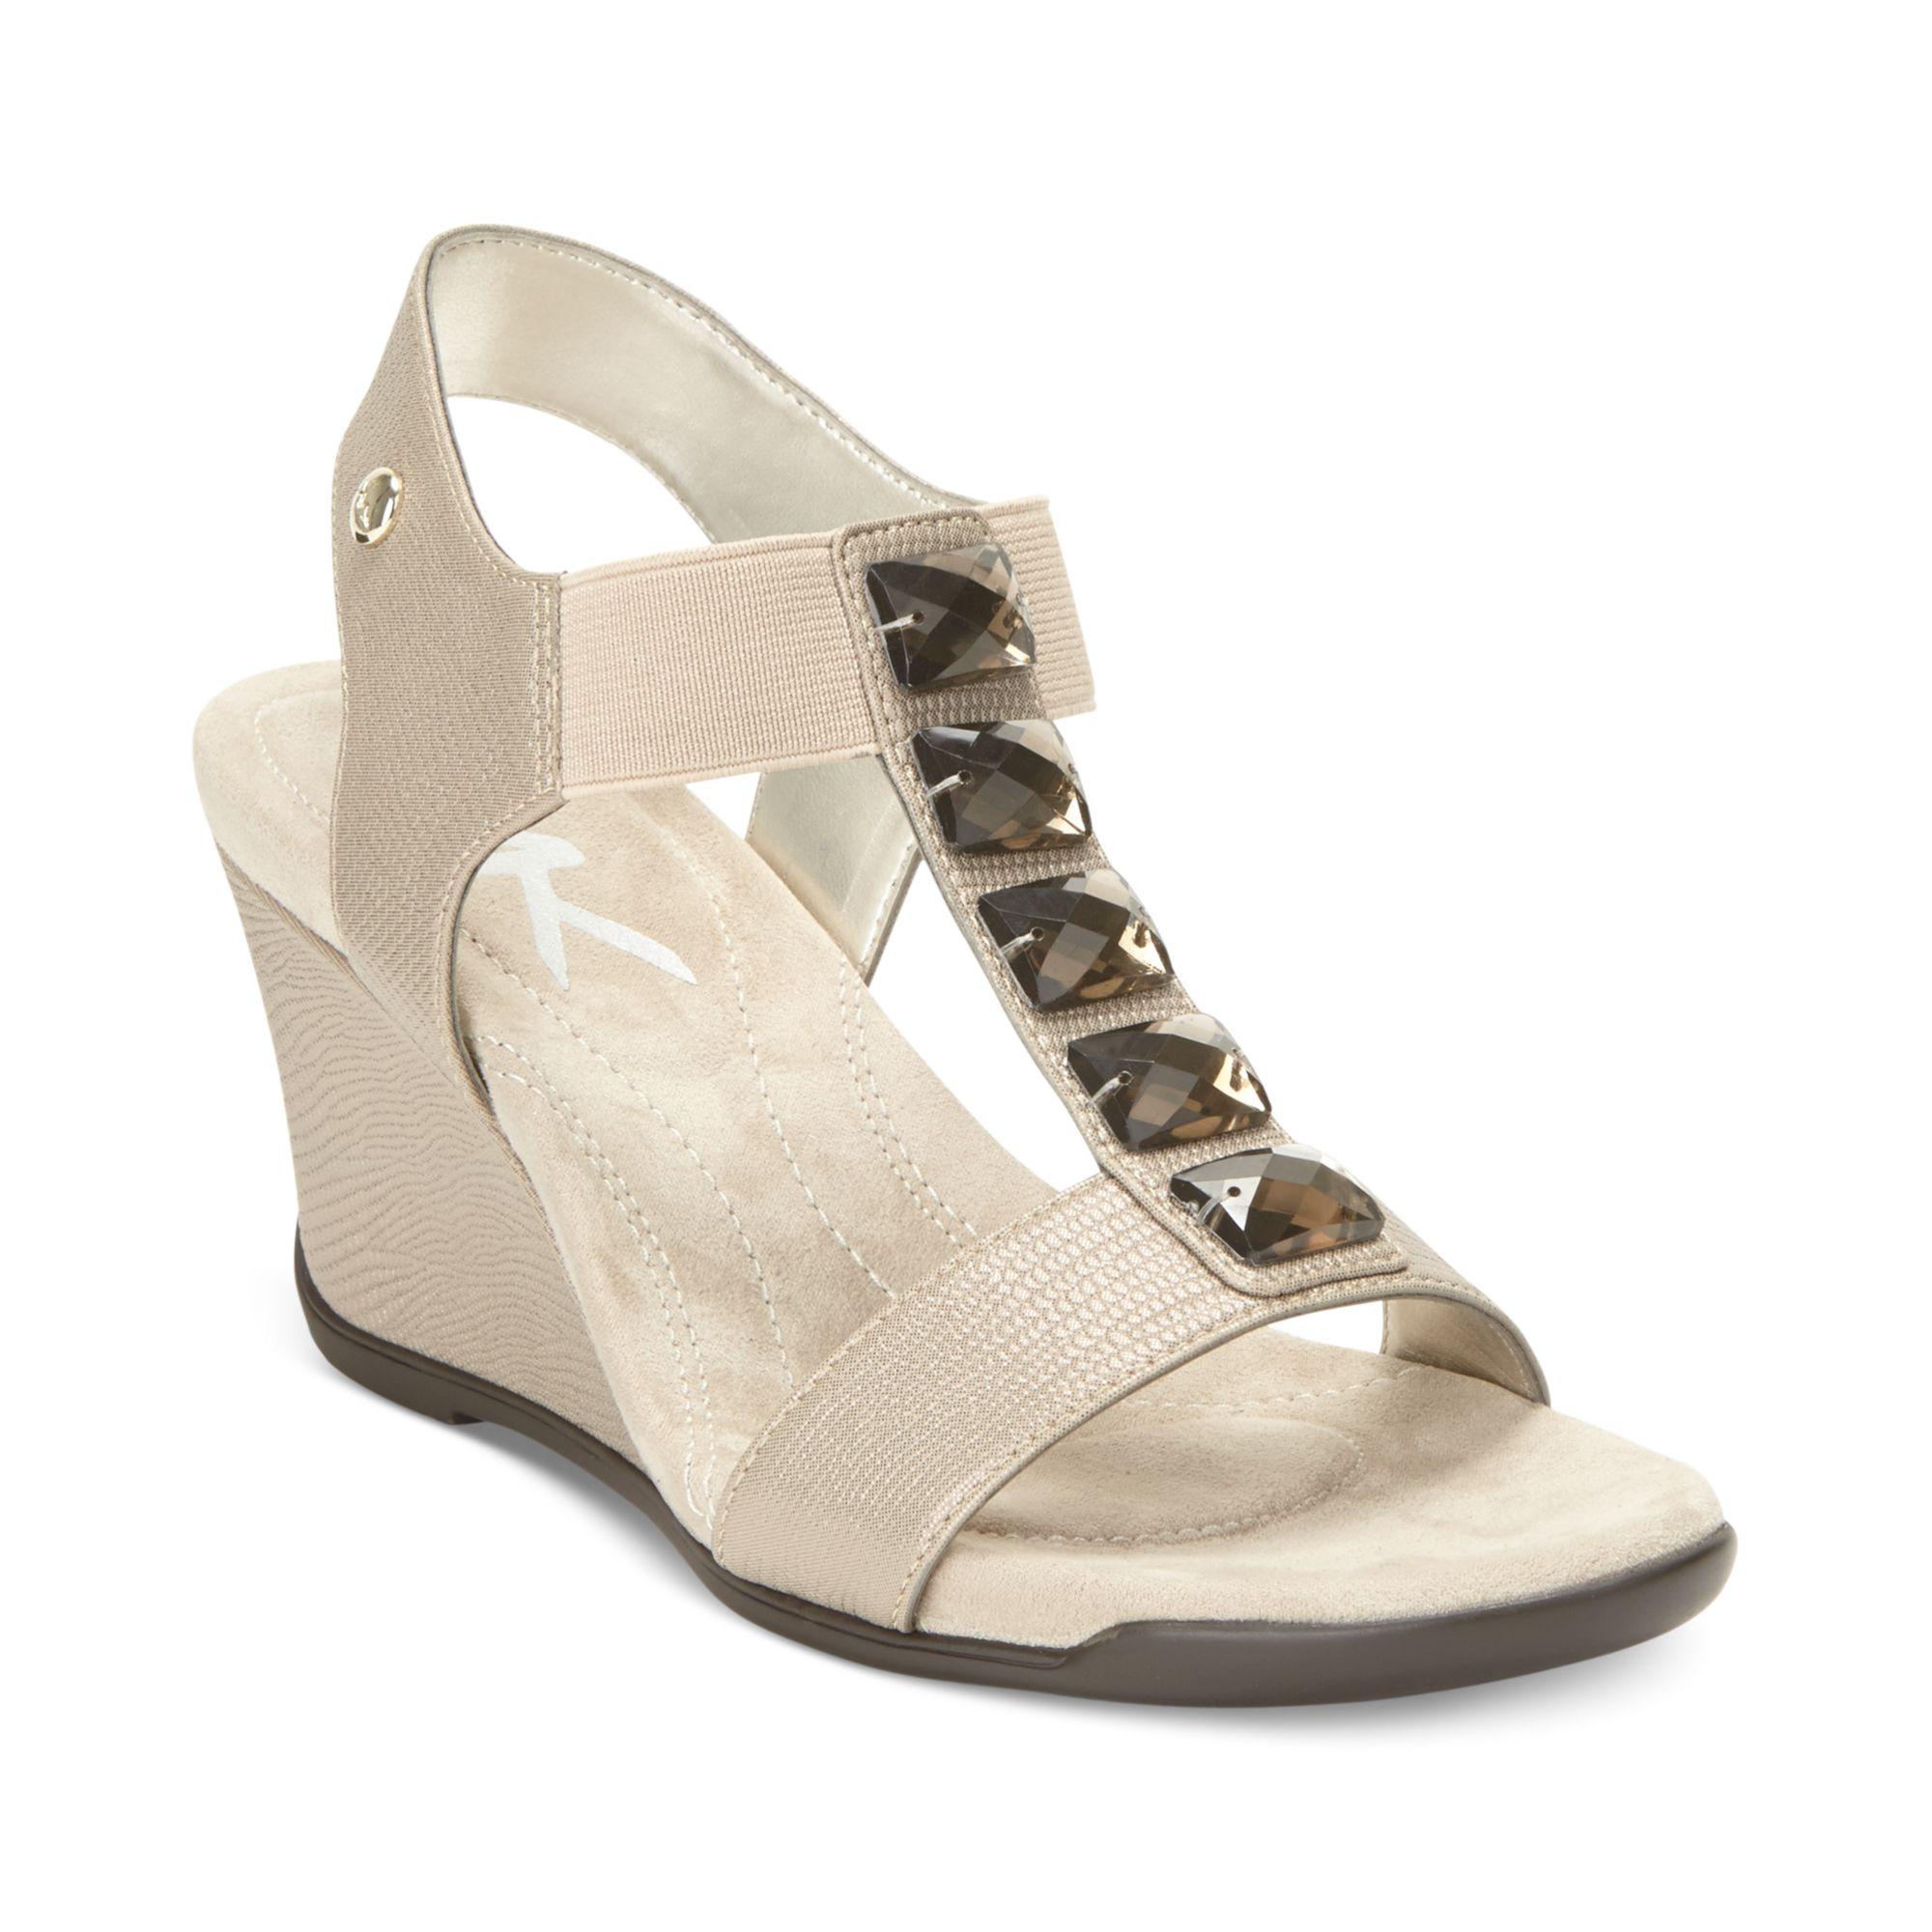 7a32a675df57 Lyst - Anne Klein Lofty Sport Wedge Sandals in Gray